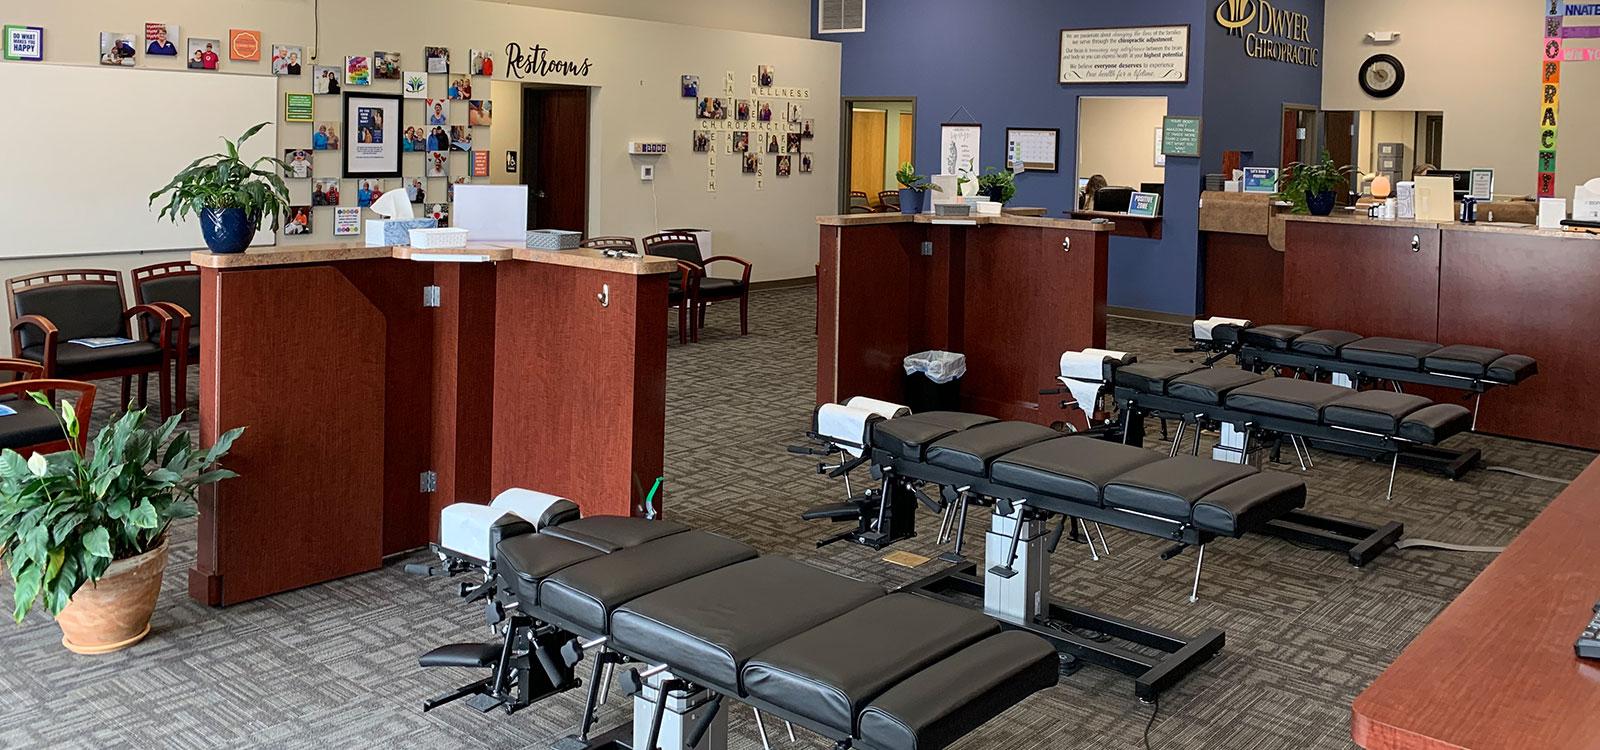 Dwyer Chiropractic office interior